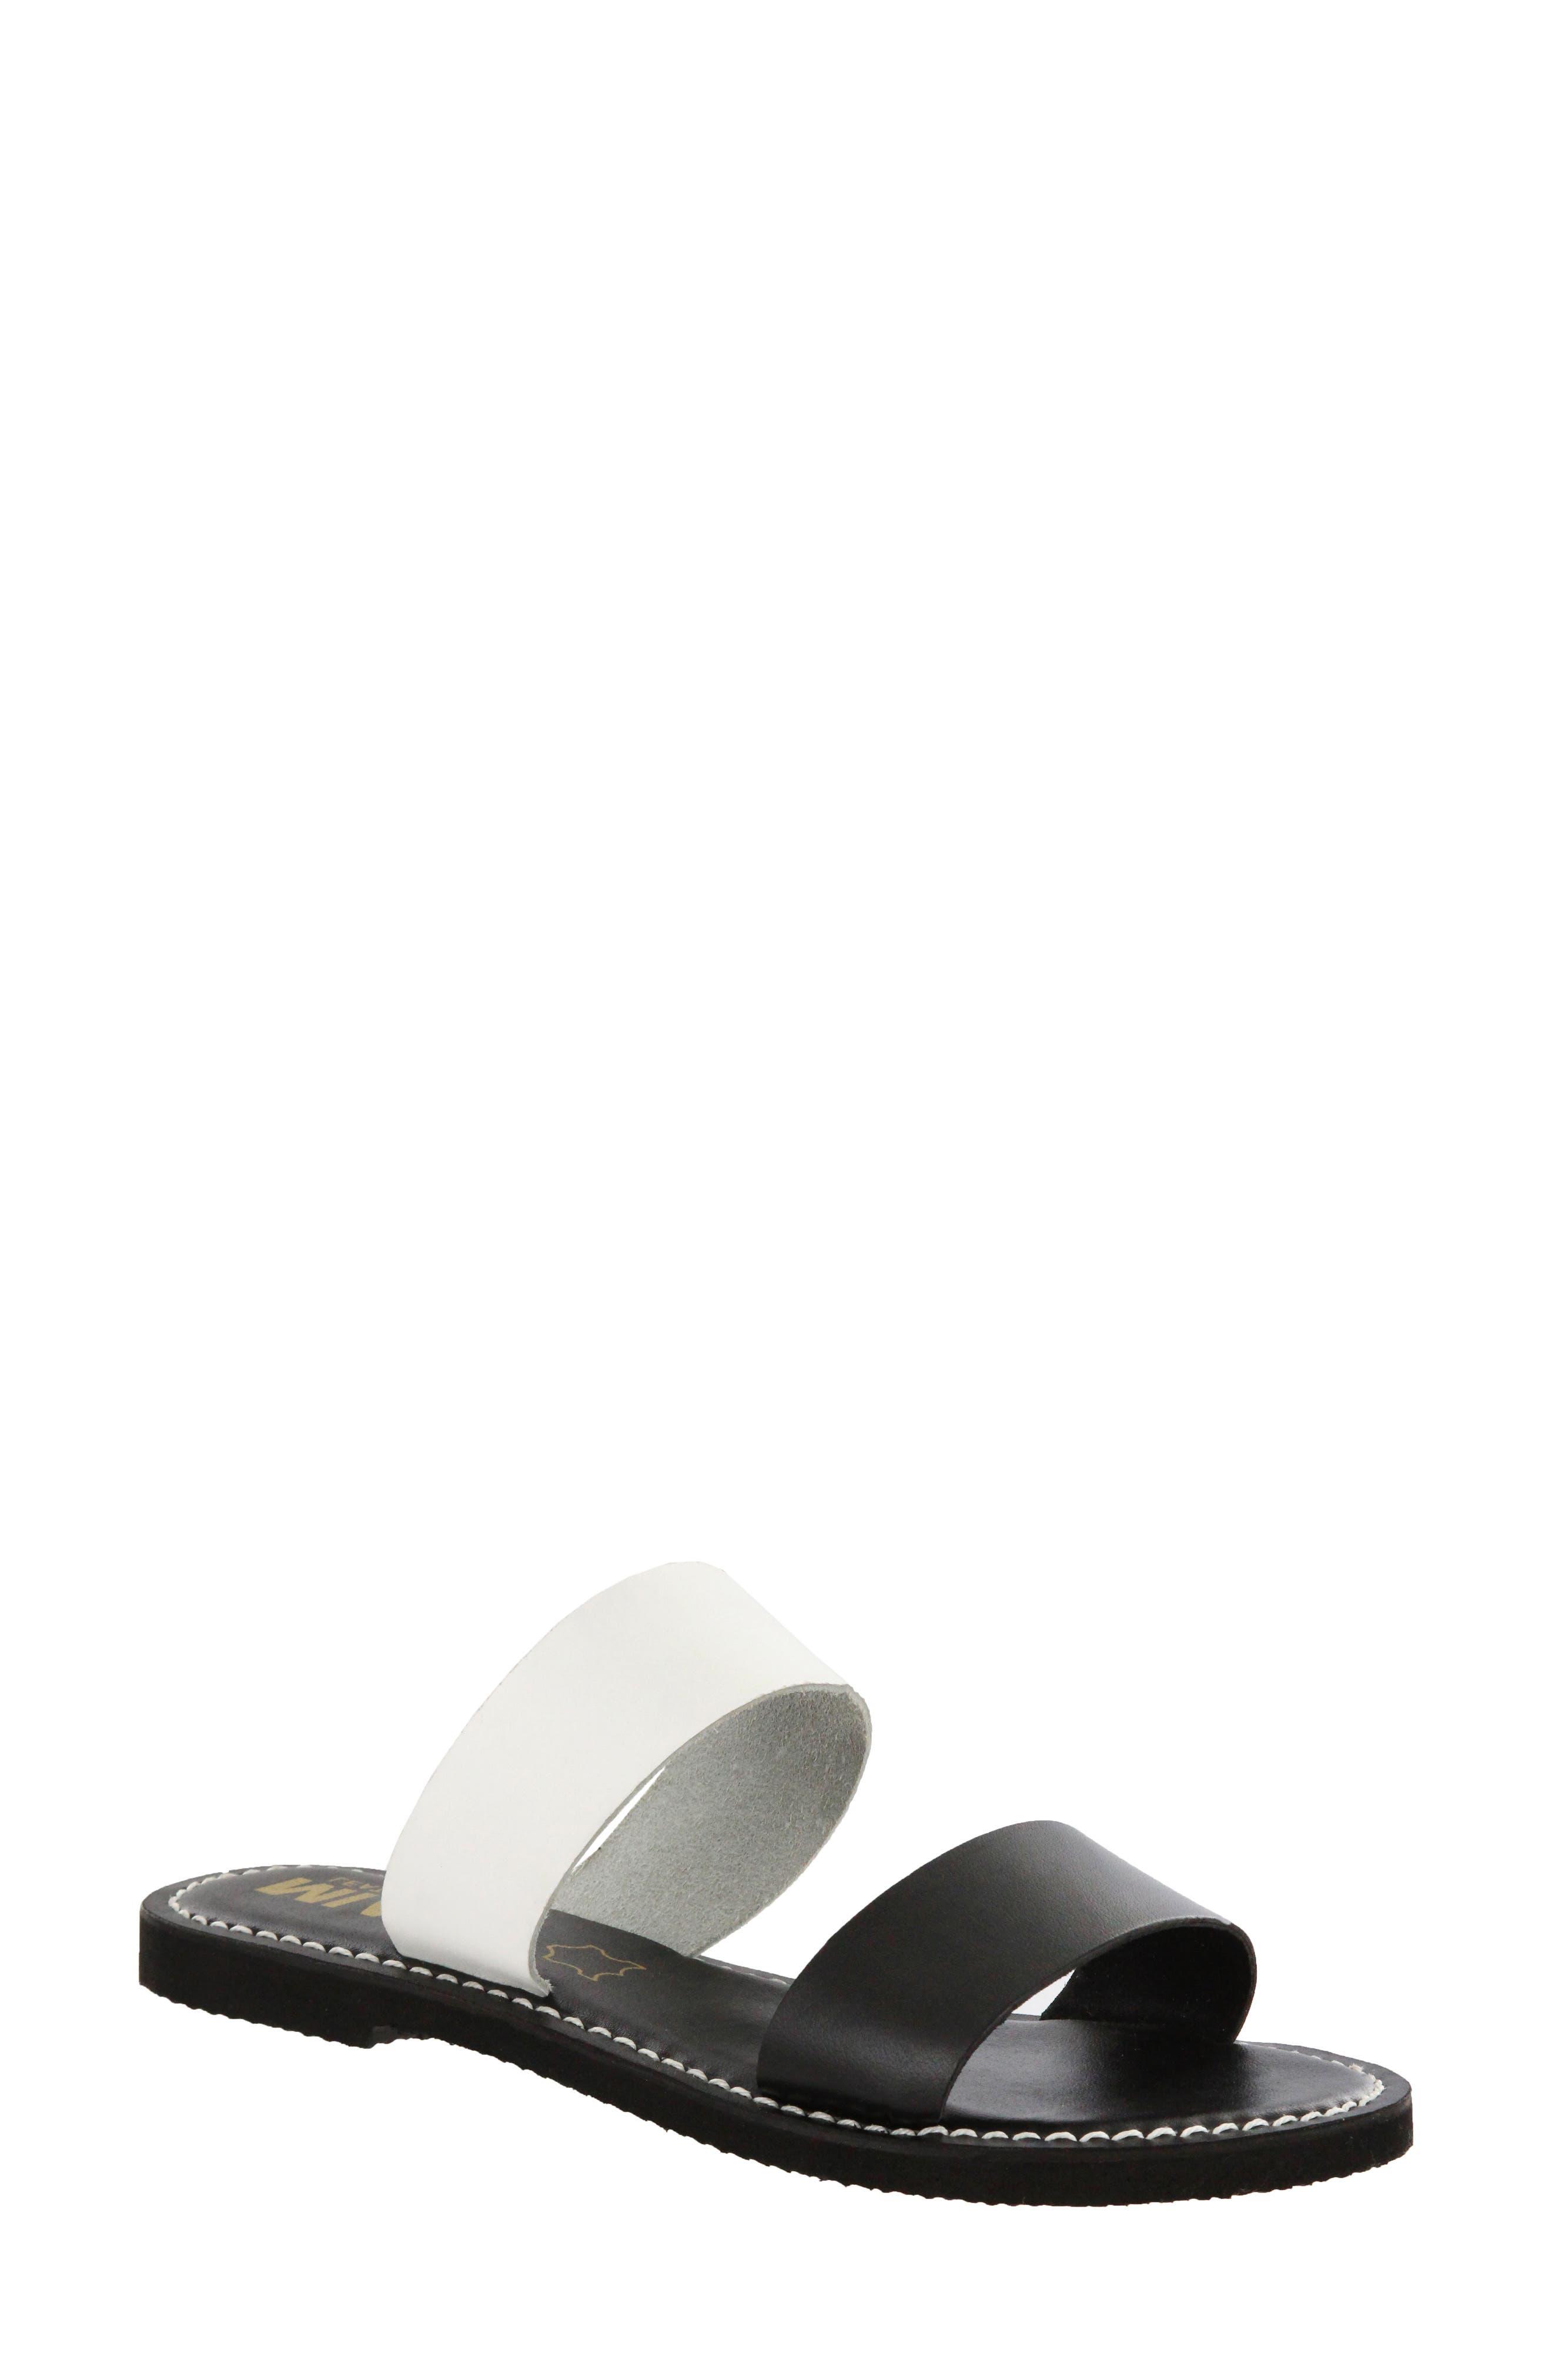 Nila Two-Band Slide Sandal,                         Main,                         color, 004